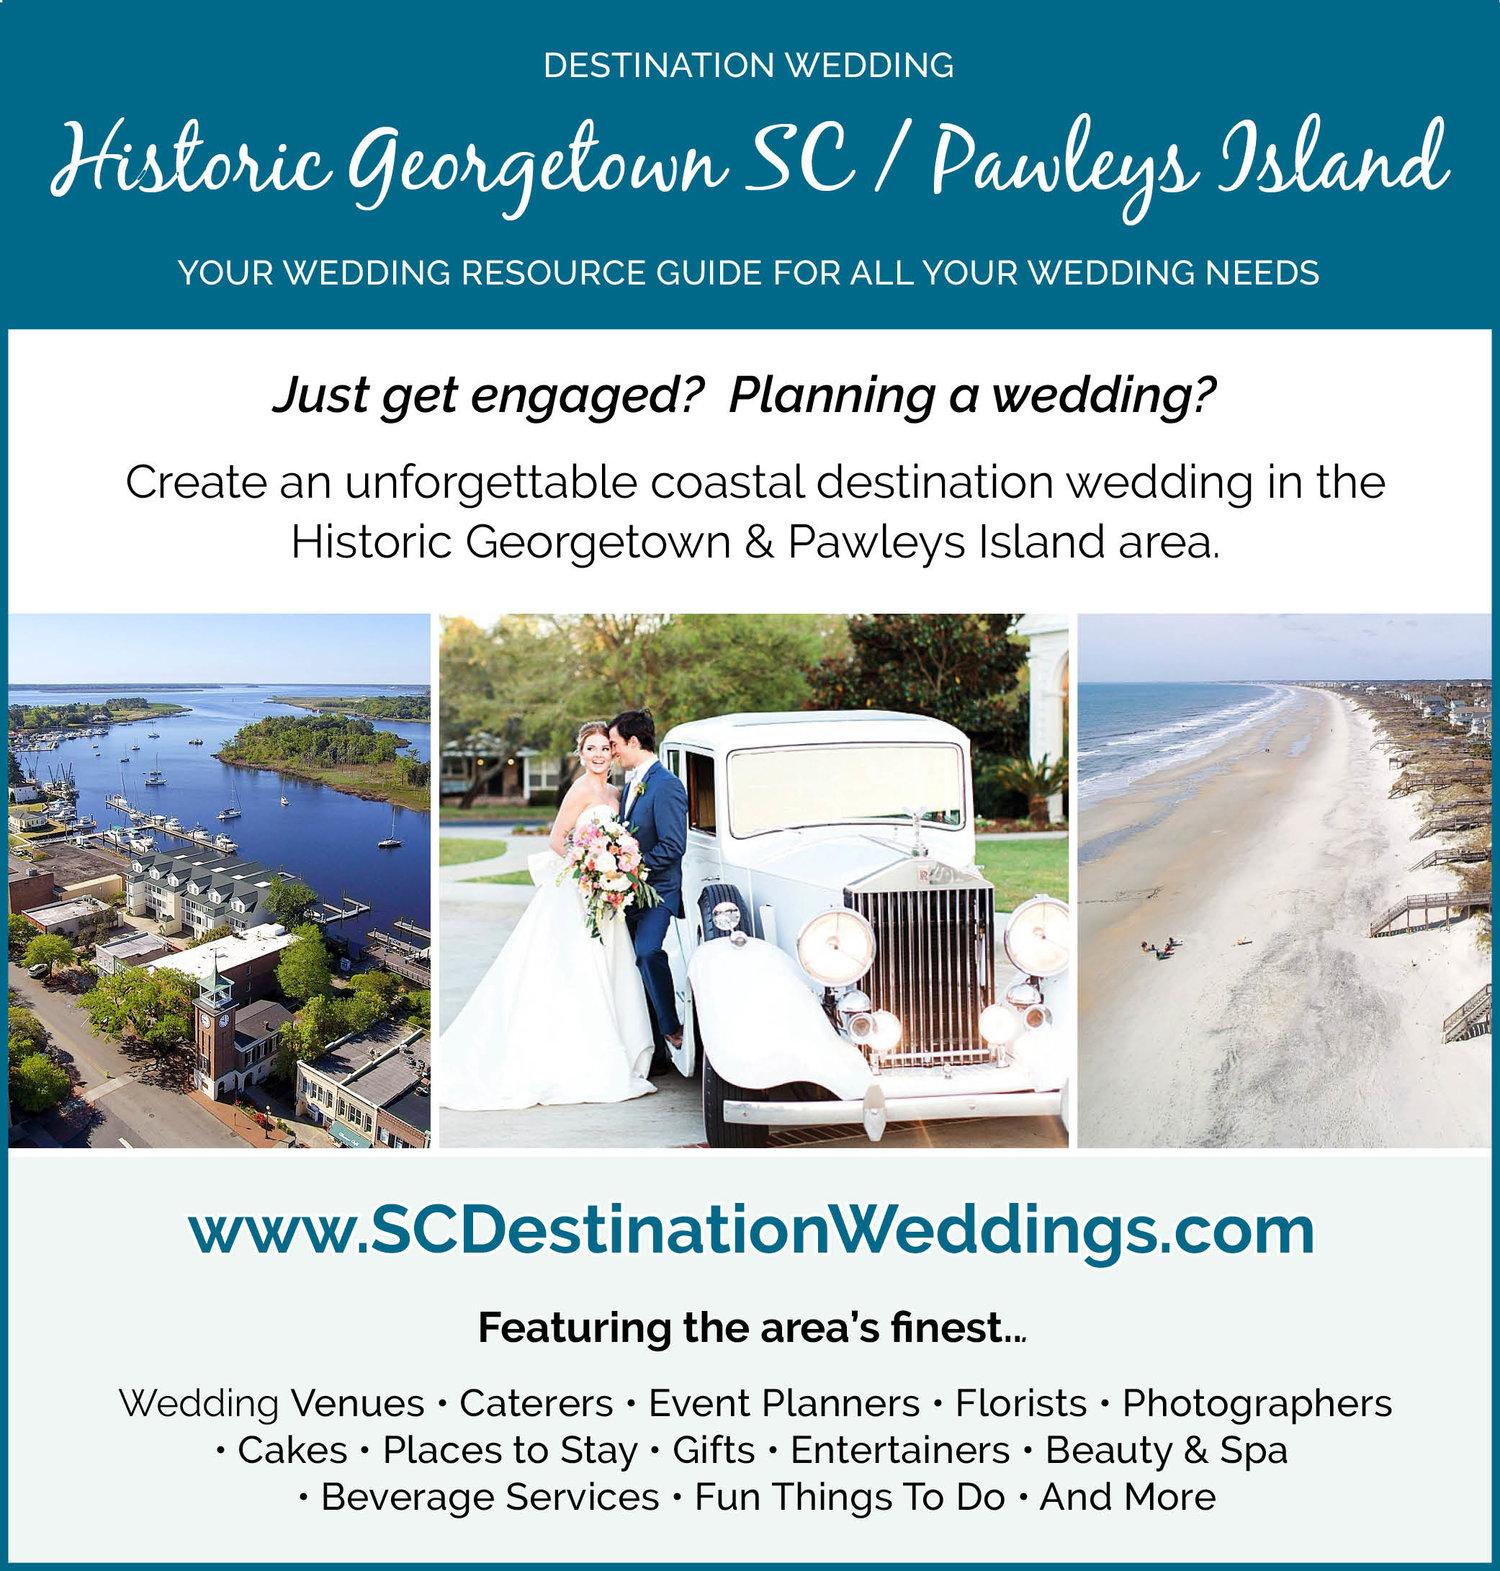 Indian Weddings Wedding Venues Rehearsal Dinner Venues Small Event Venues Pawleys Island Georgetown Sc Sc Destination Wedding Historic Georgetown Sc Weddings Pawleys Island Weddings